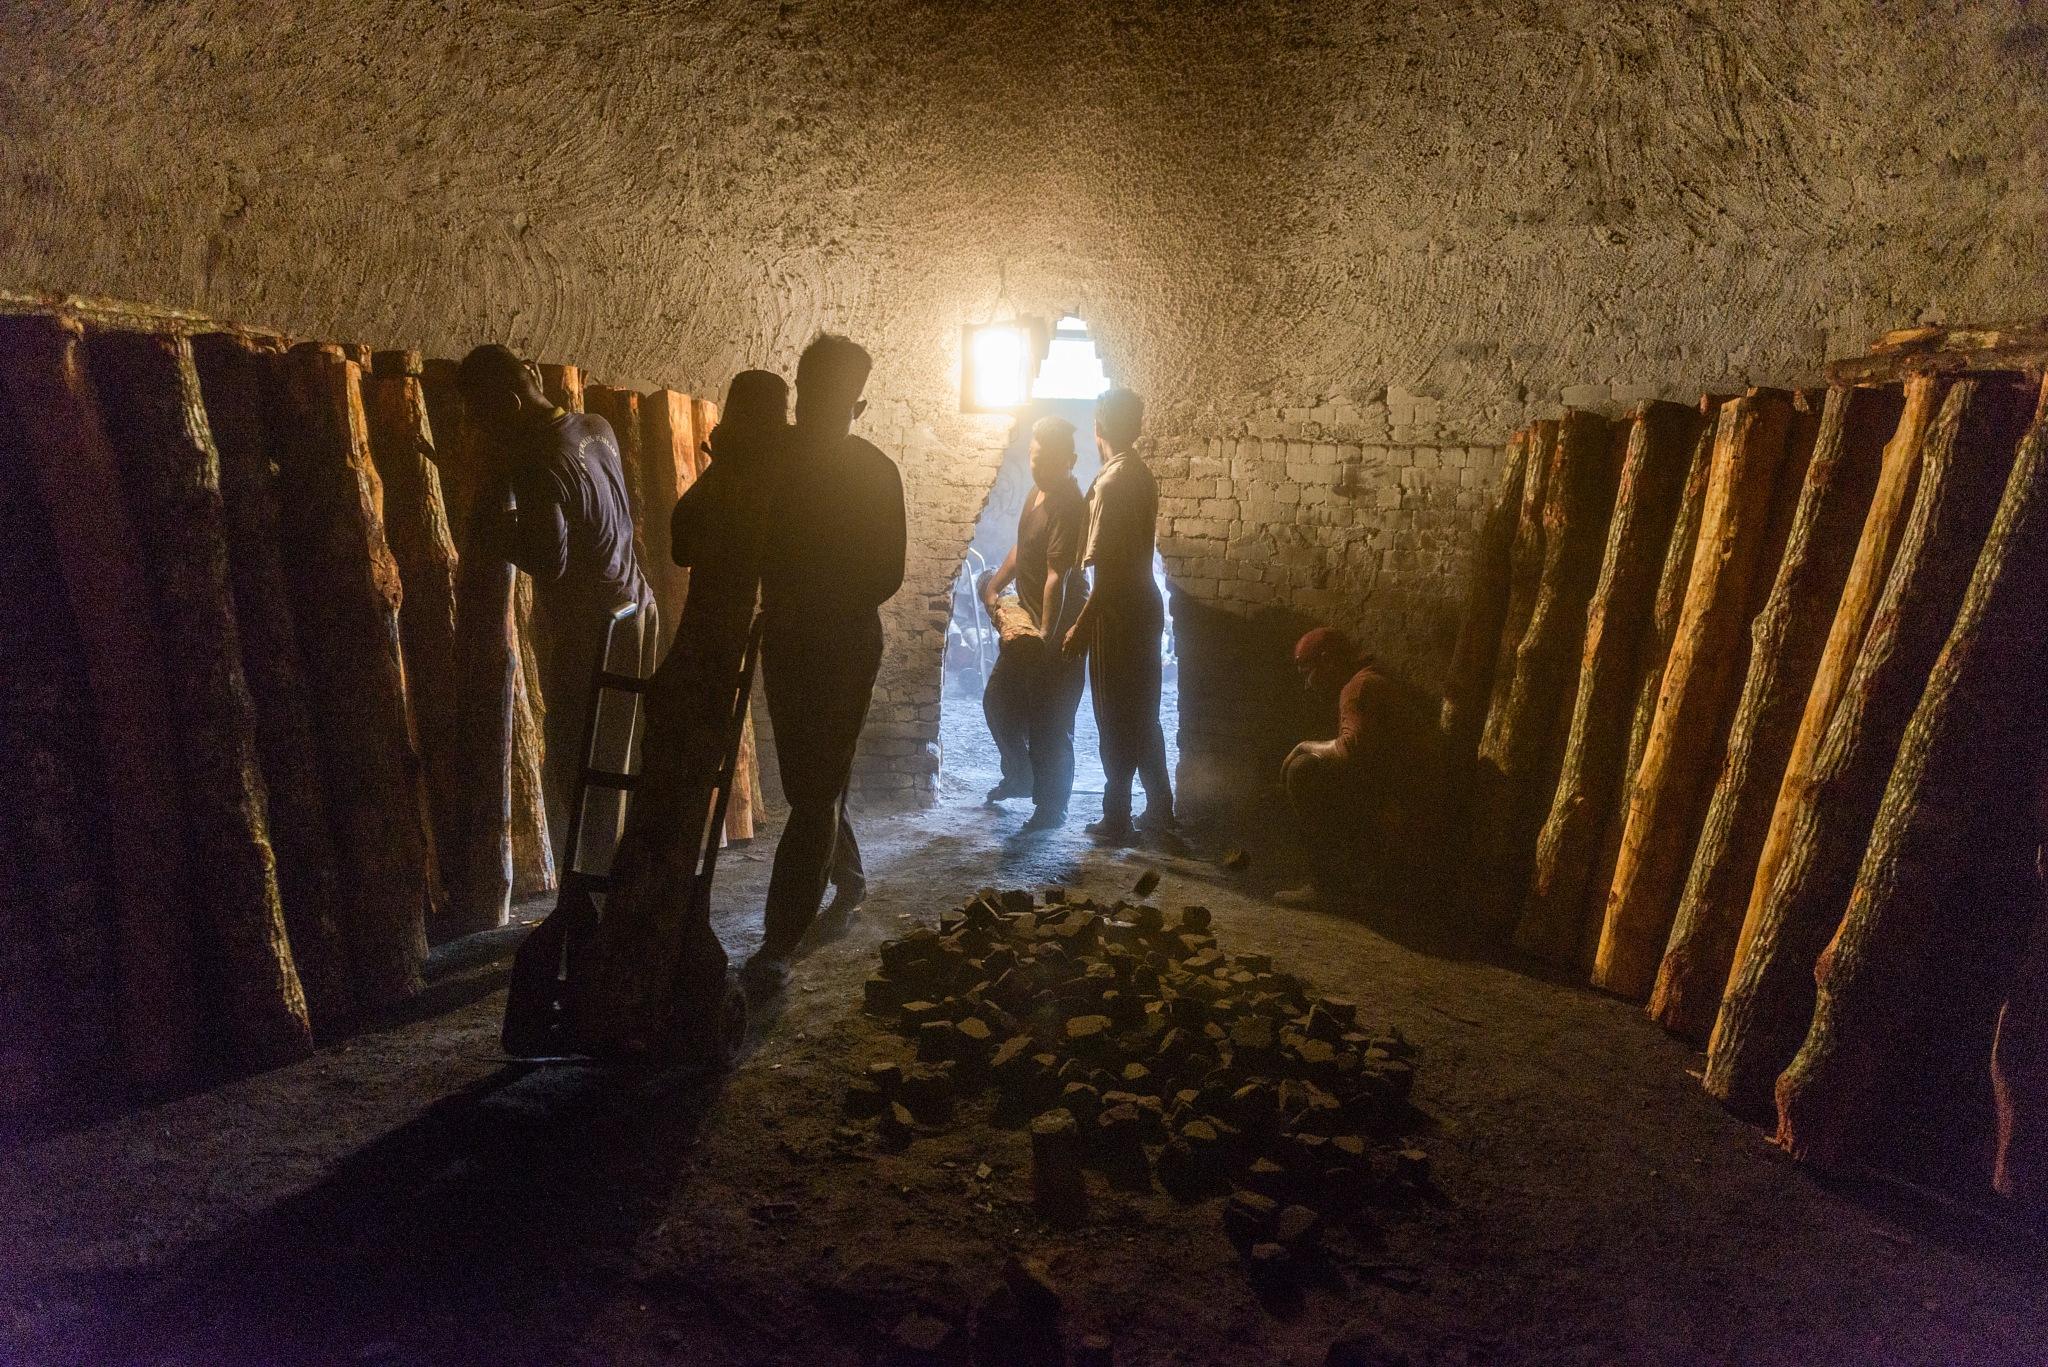 Sepetang 2014/04 - Charcoal Factory - Inside the kiln #19 by klchin66